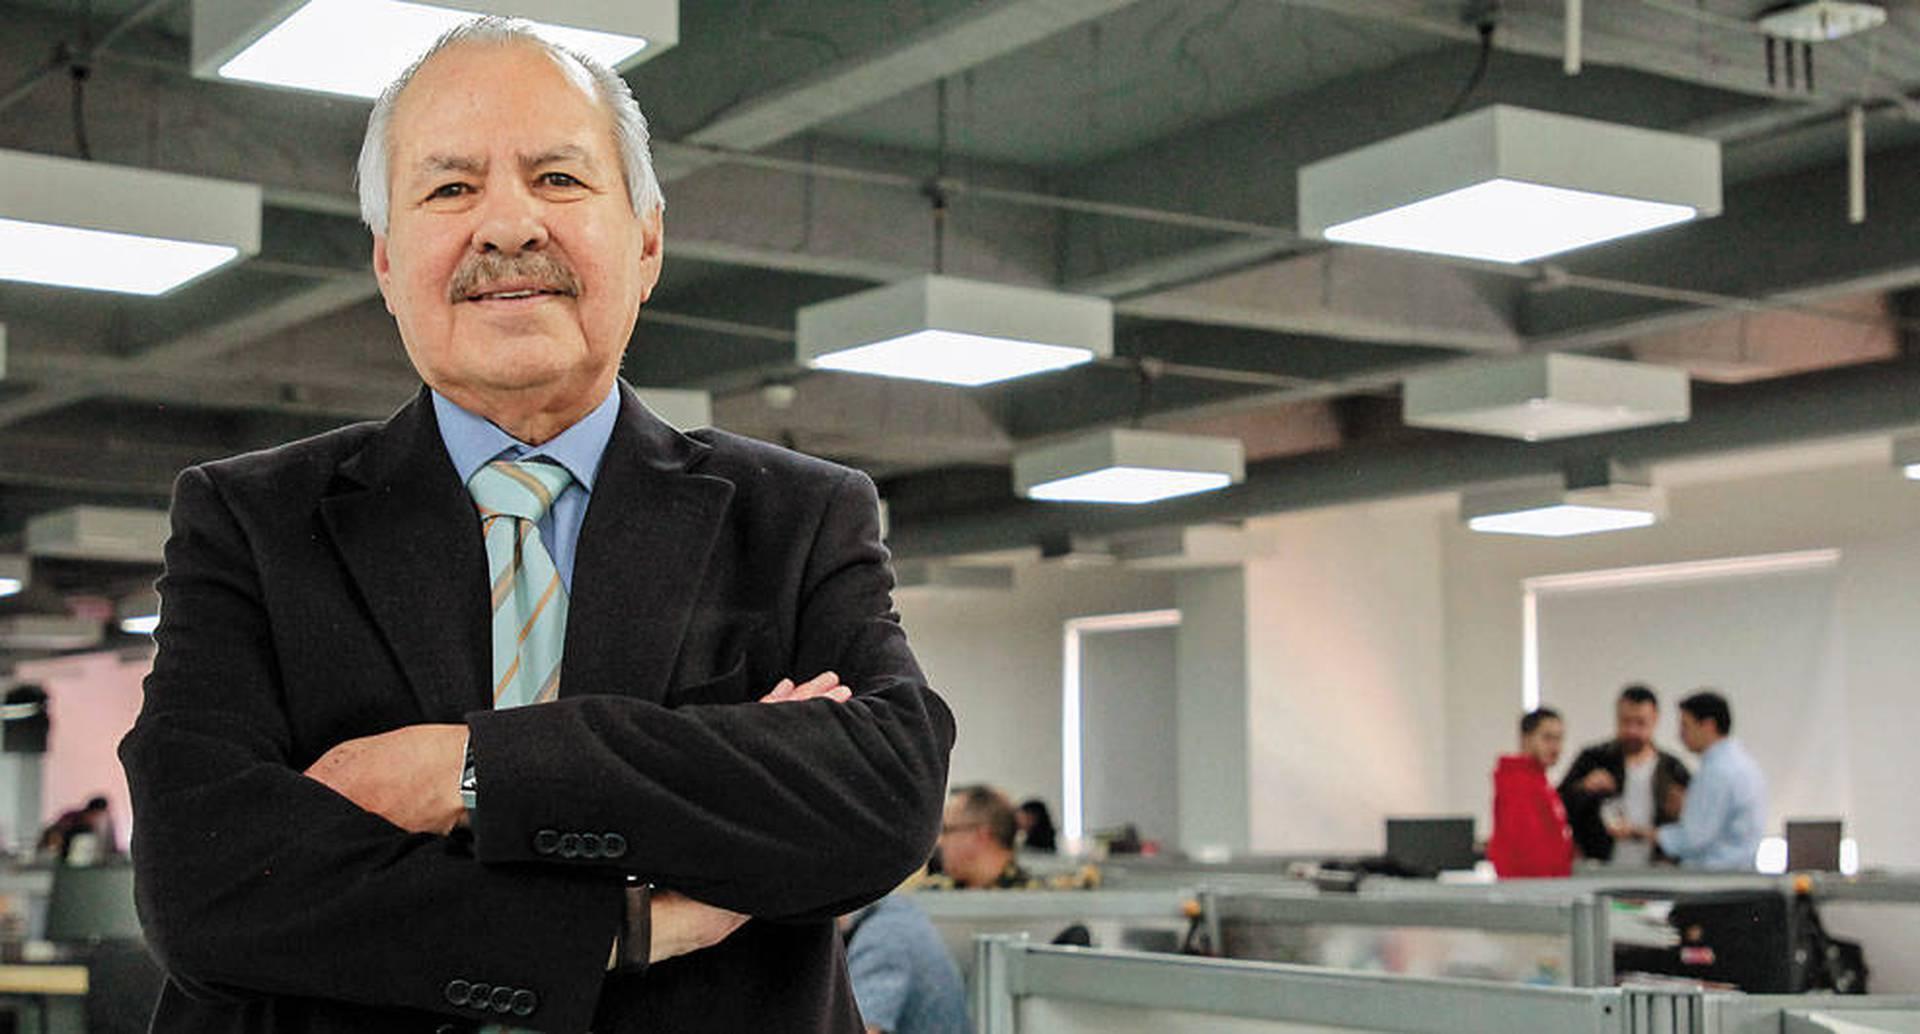 Darío Arizmendi